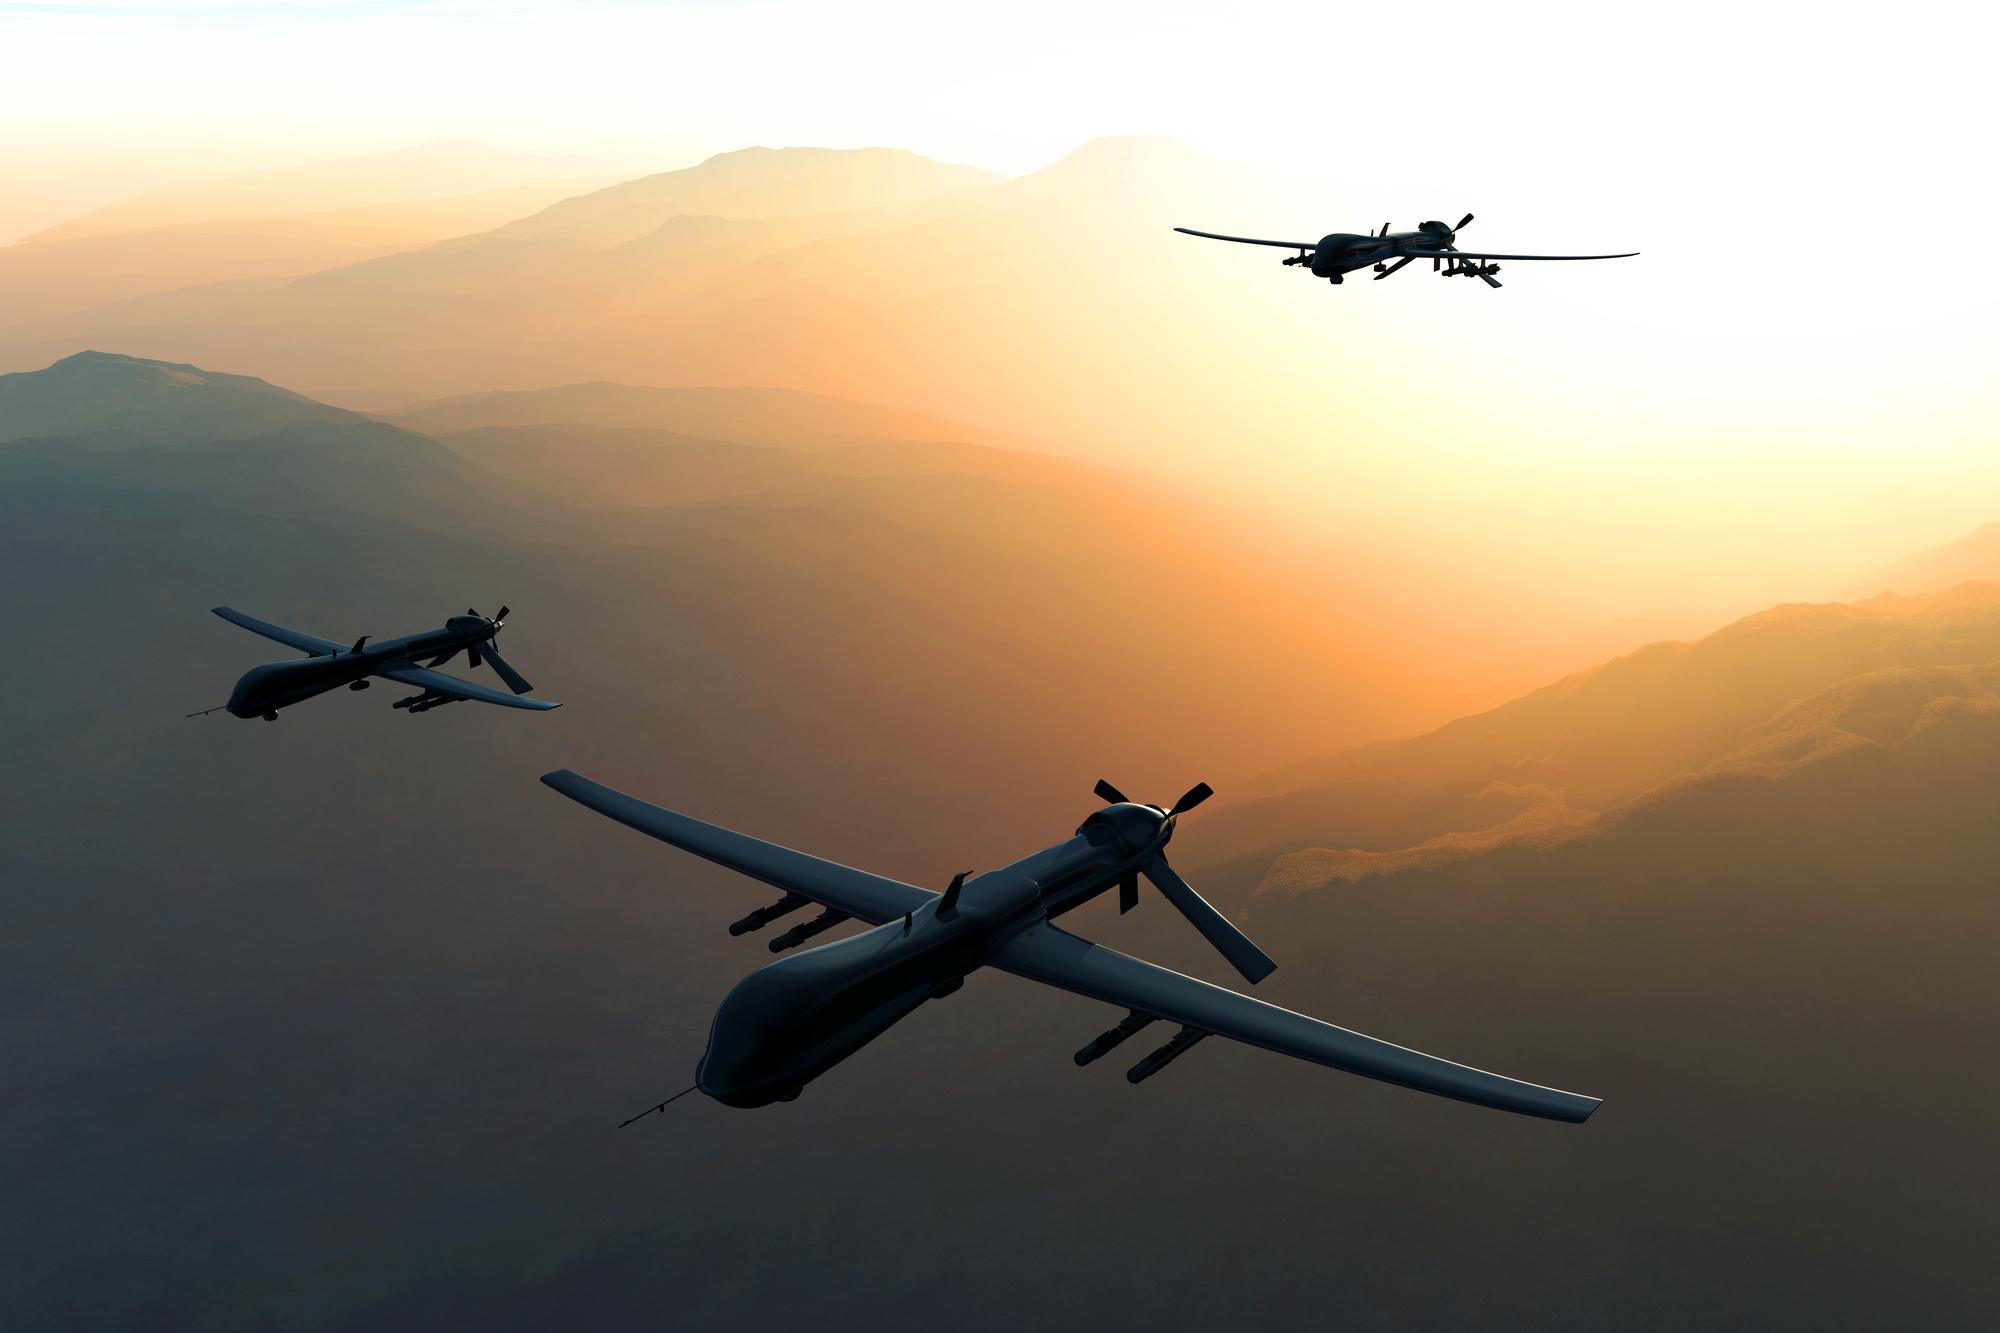 Drones, image courtesy of Pond5/boscorelli.